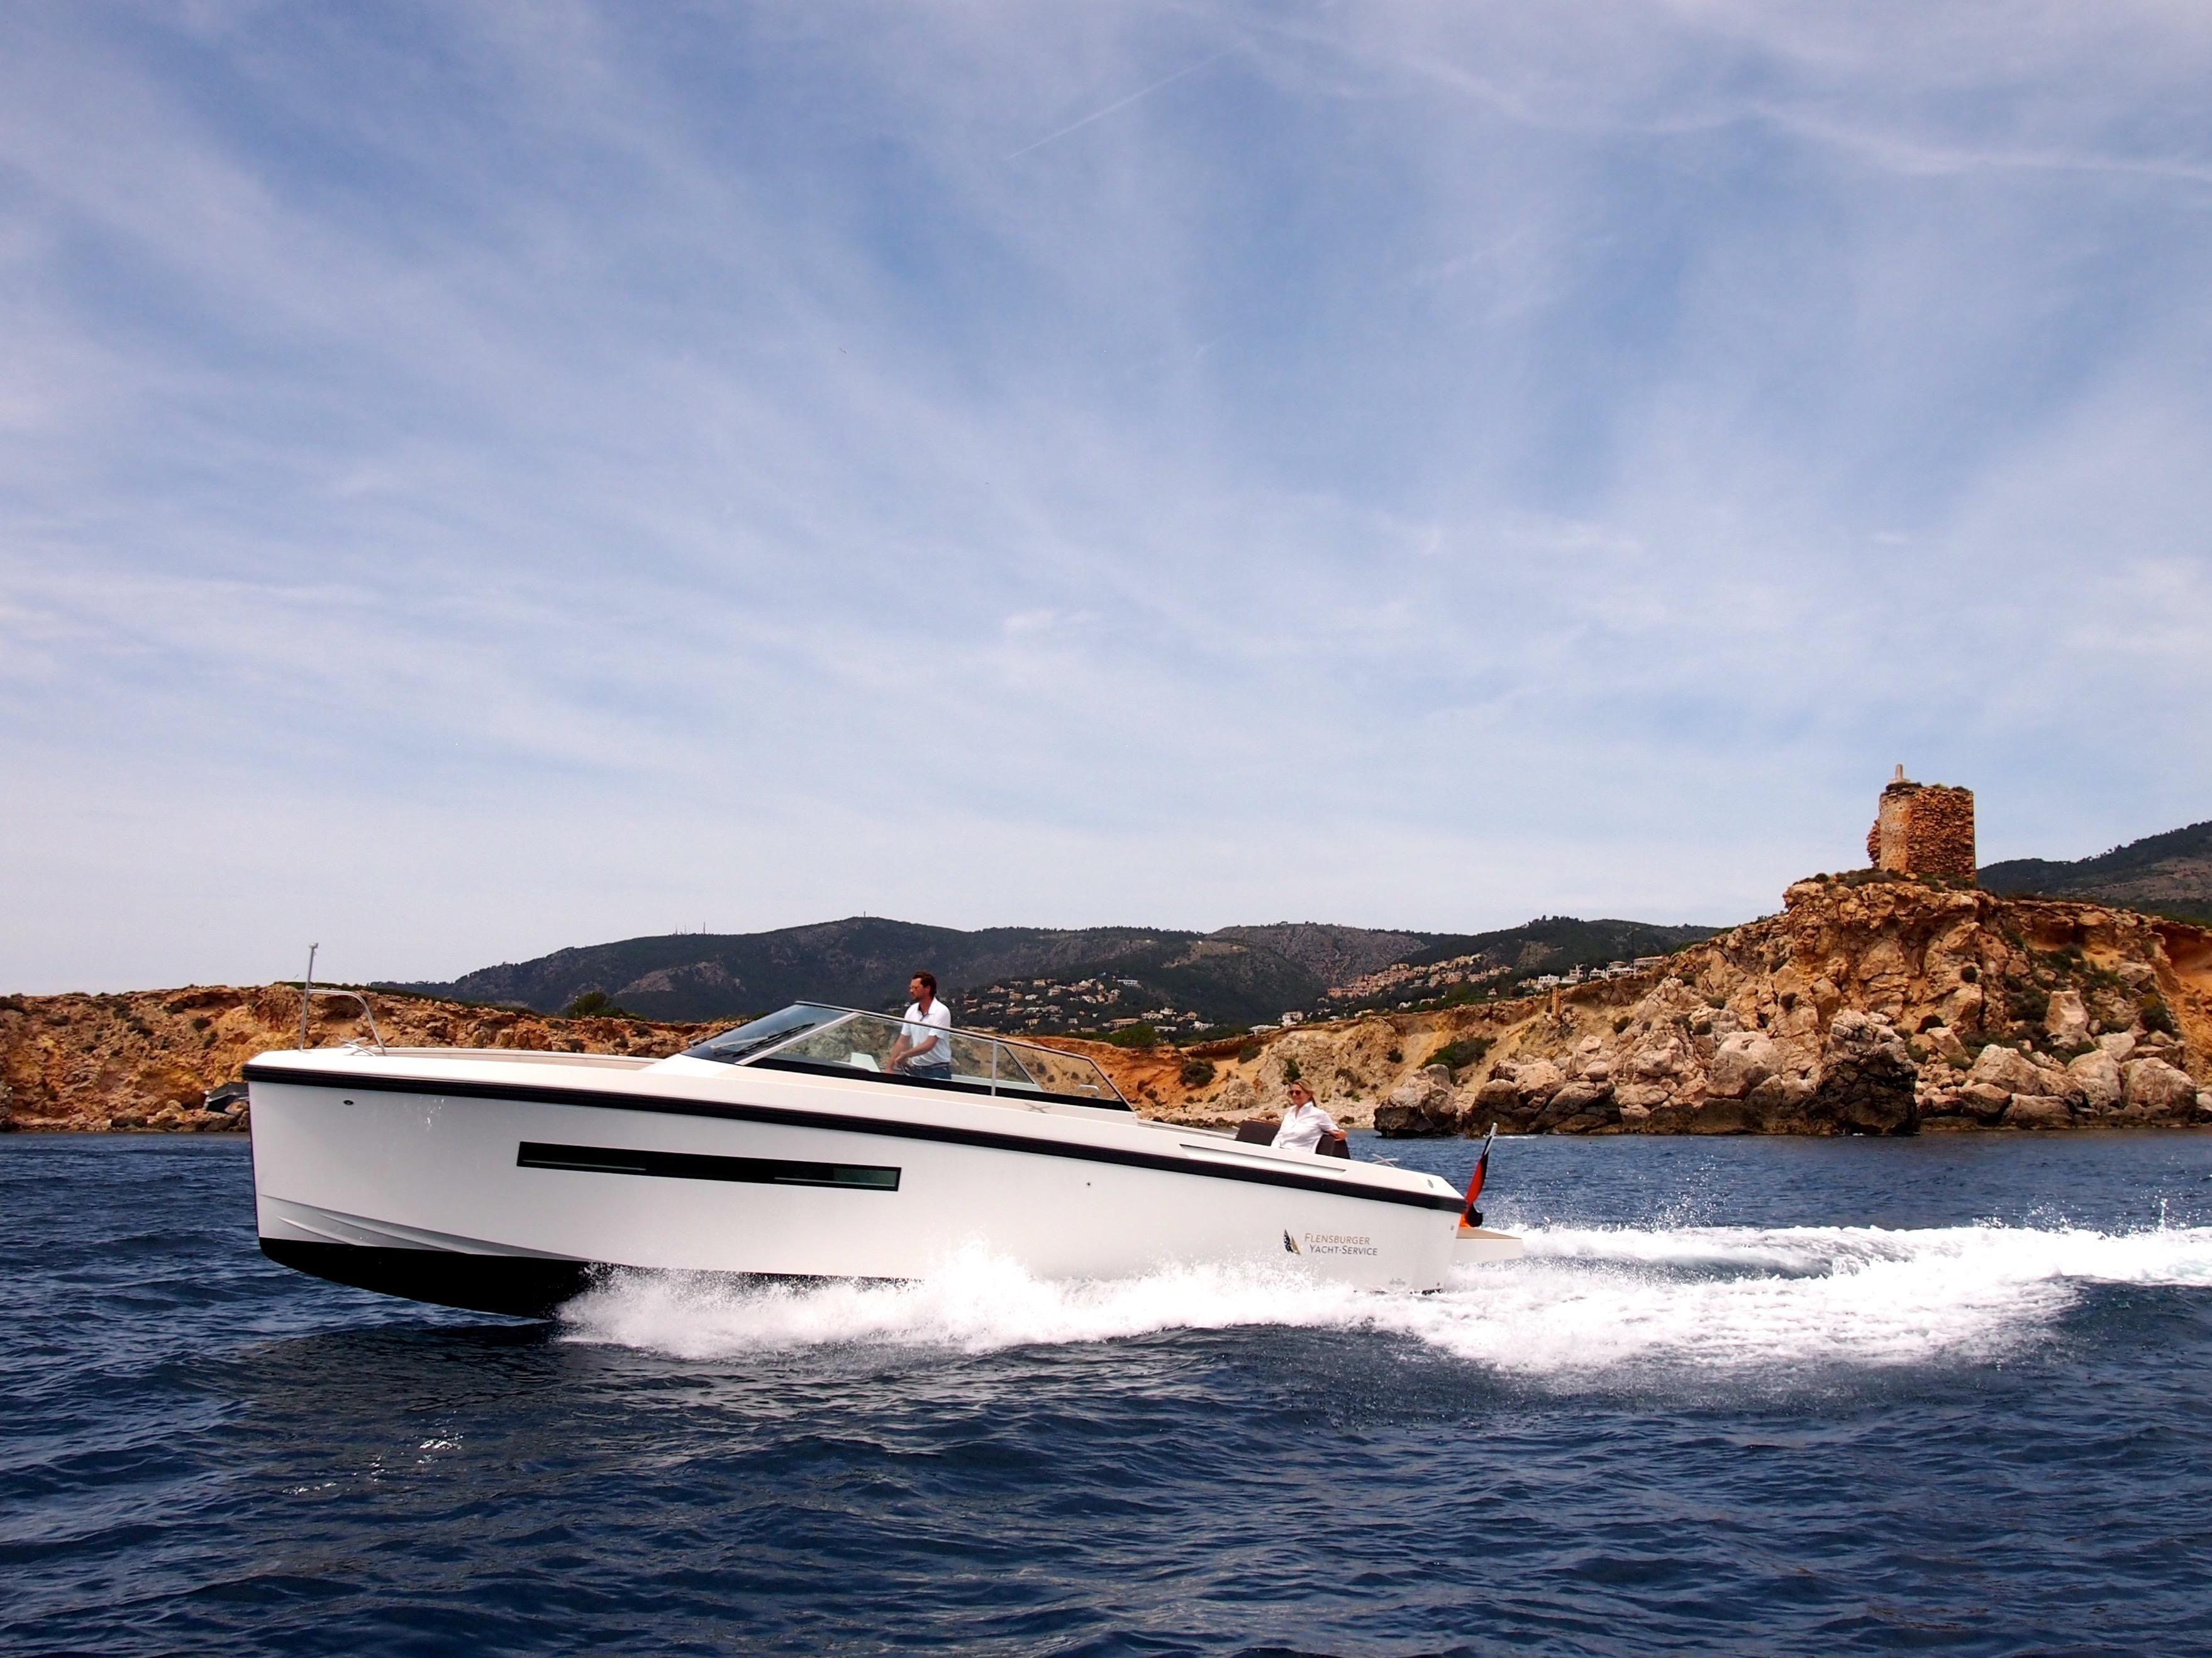 Deep Impact Boats >> 2015 Delta Powerboats Delta 33 Open Power Boat For Sale - www.yachtworld.com